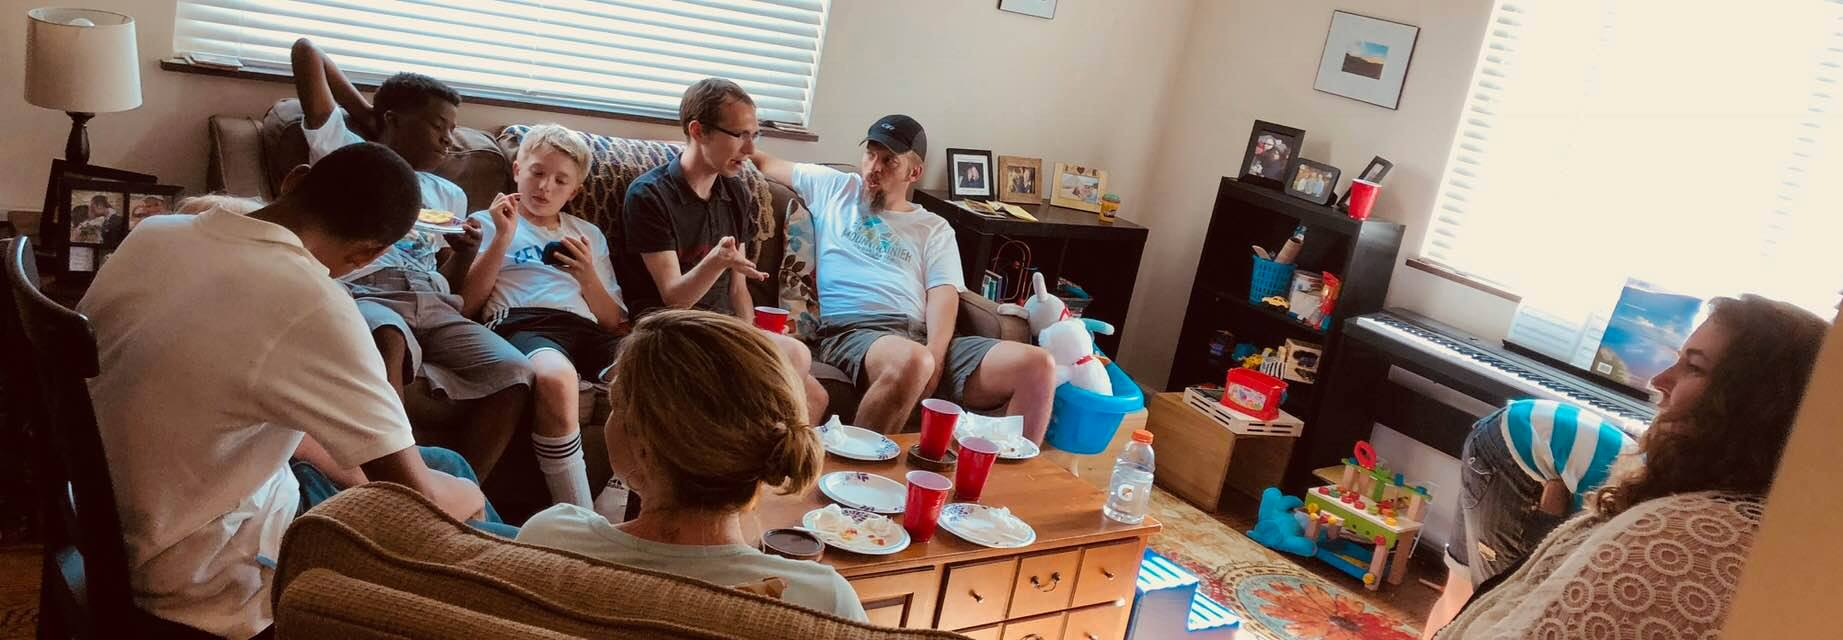 mission community 5.20 conversation.jpg